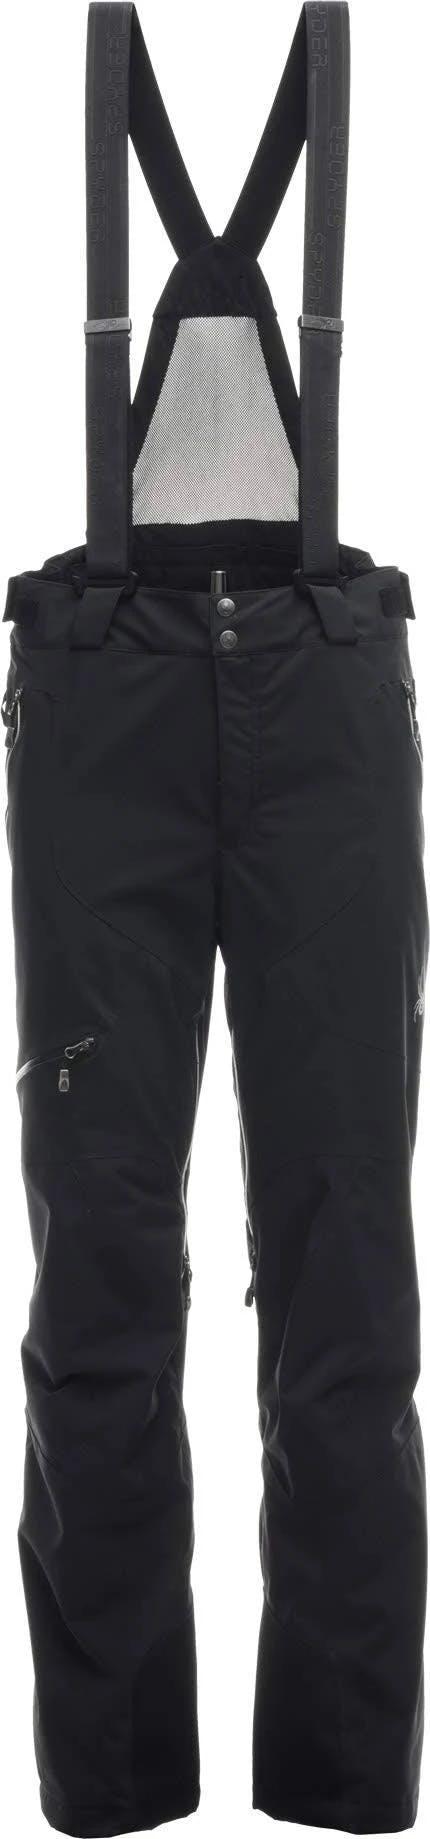 Spyder Men's Propulsion Pant XXL / Black/black